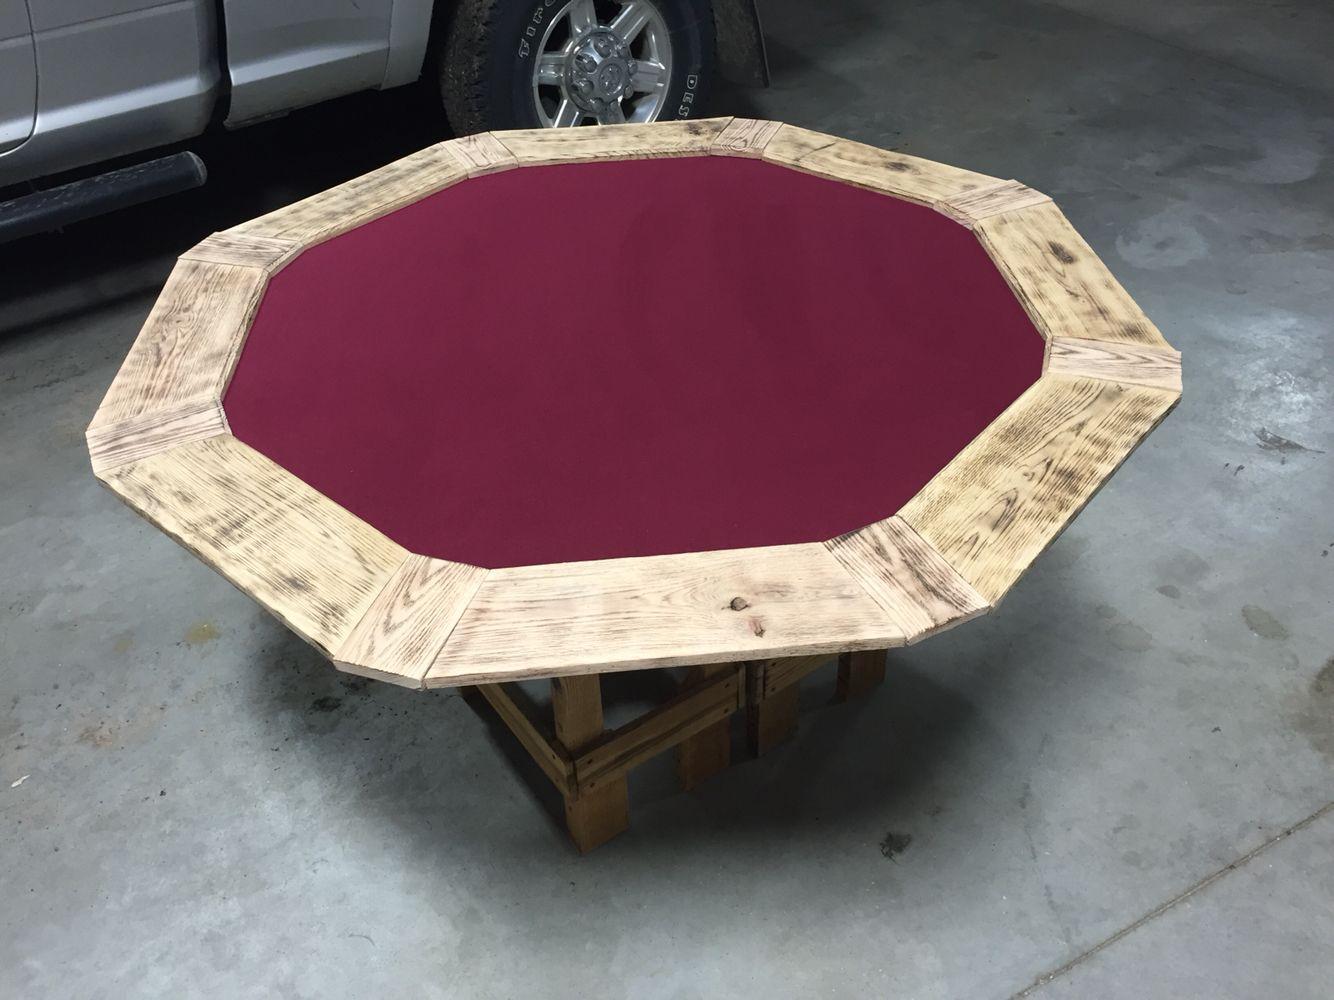 Pallet poker table diy projects pinterest poker for Pottery barn poker table